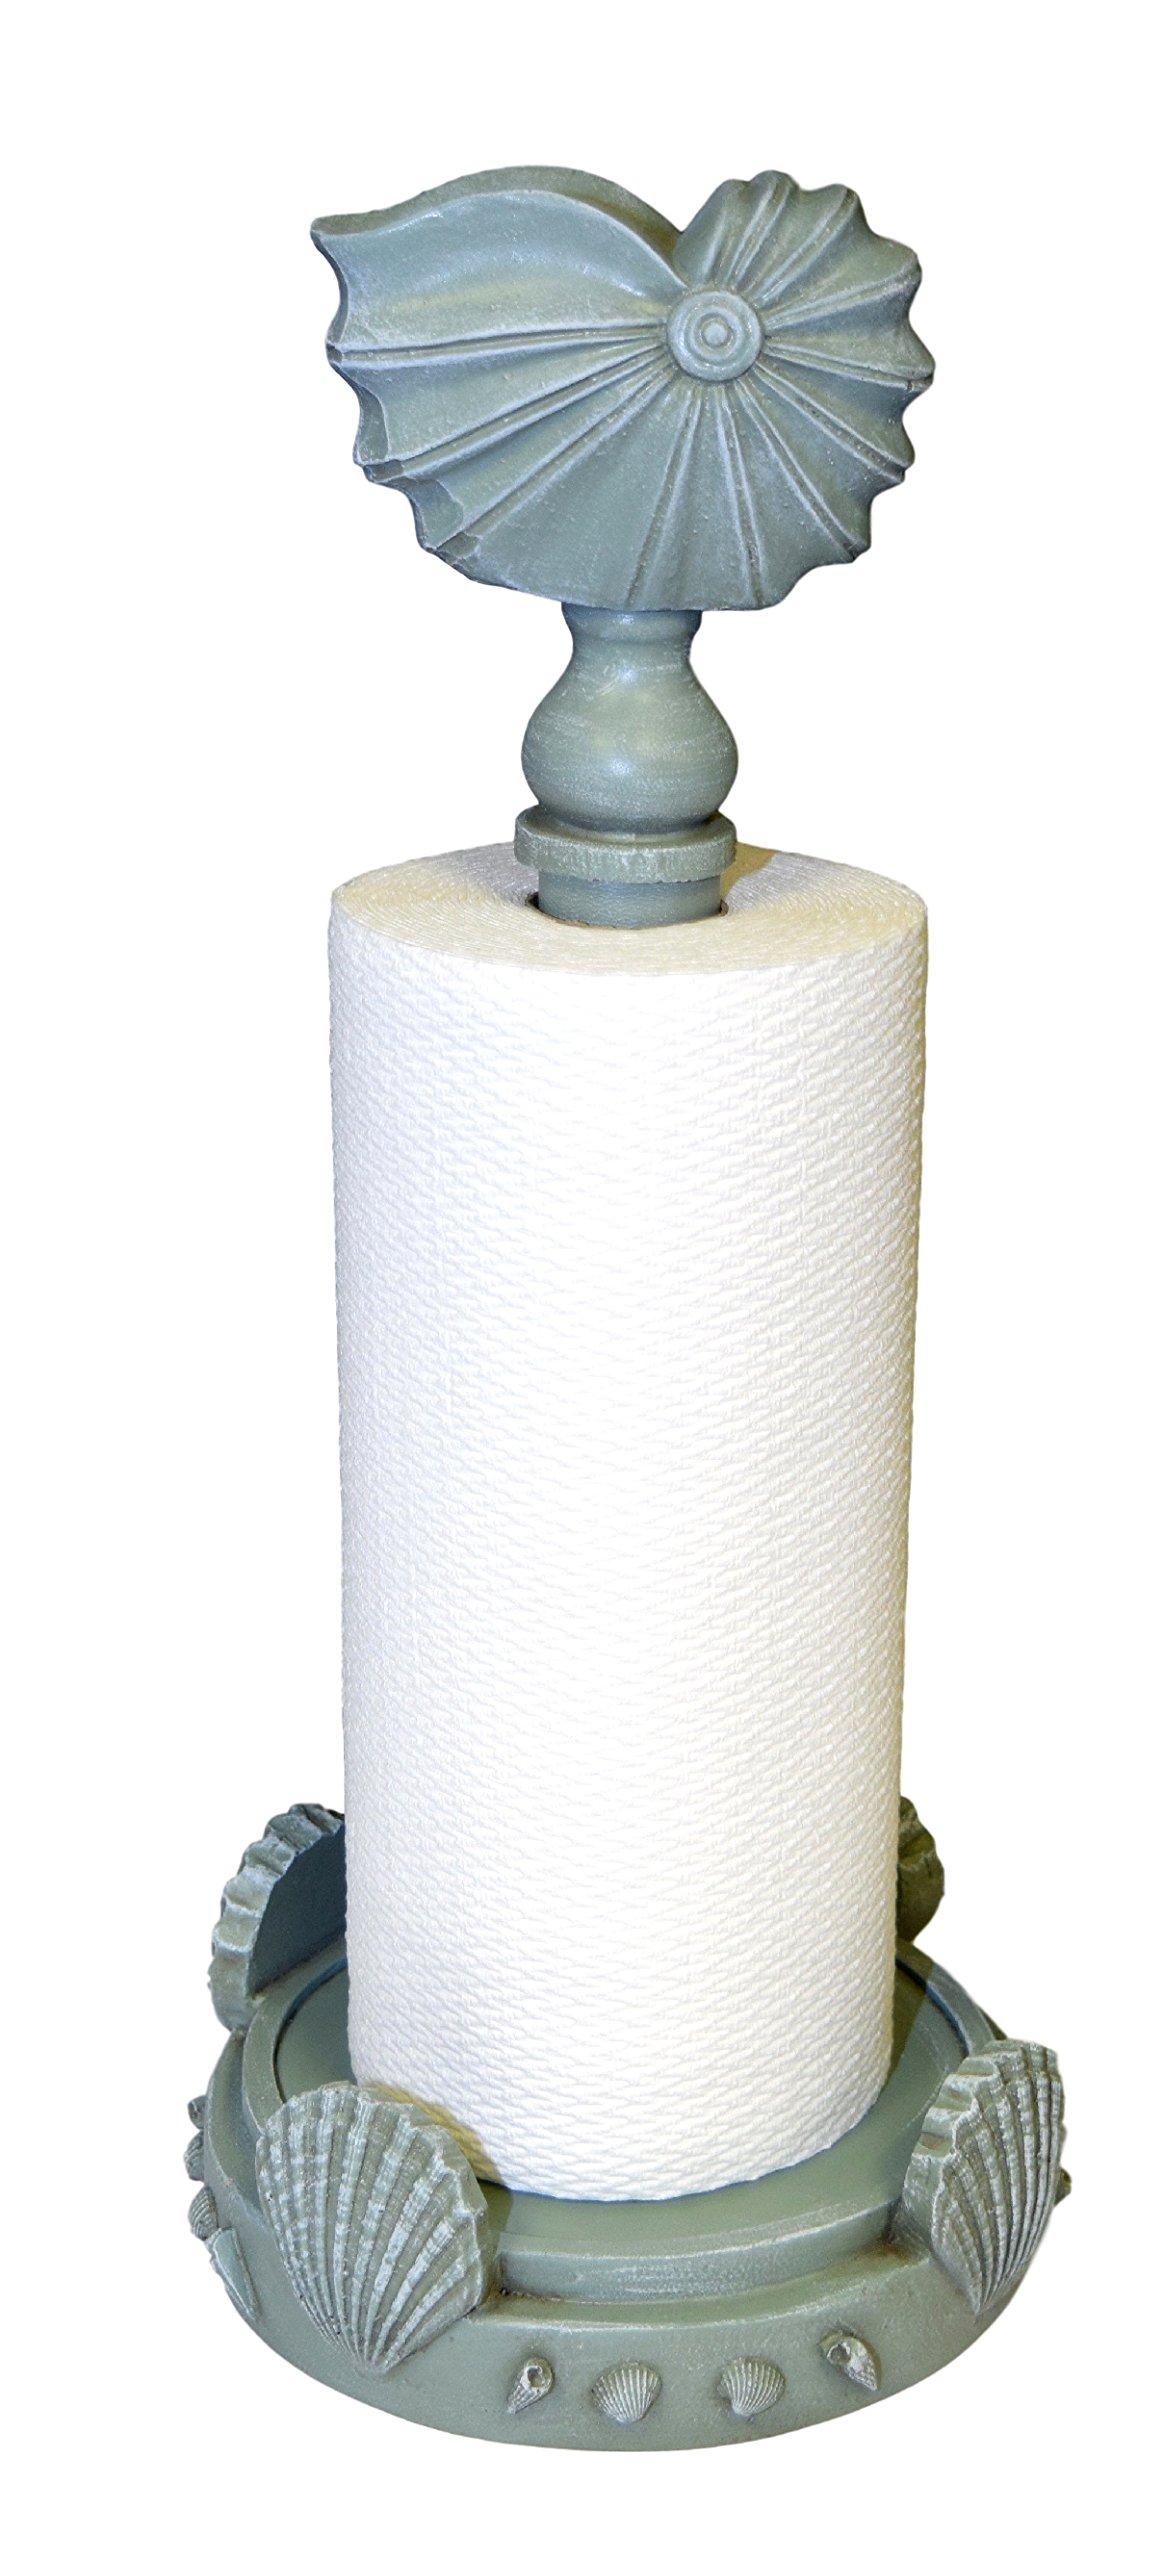 Hickory Manor House Nautilus Paper Towel Holder/Seamist Seamiest by Hickory Manor House